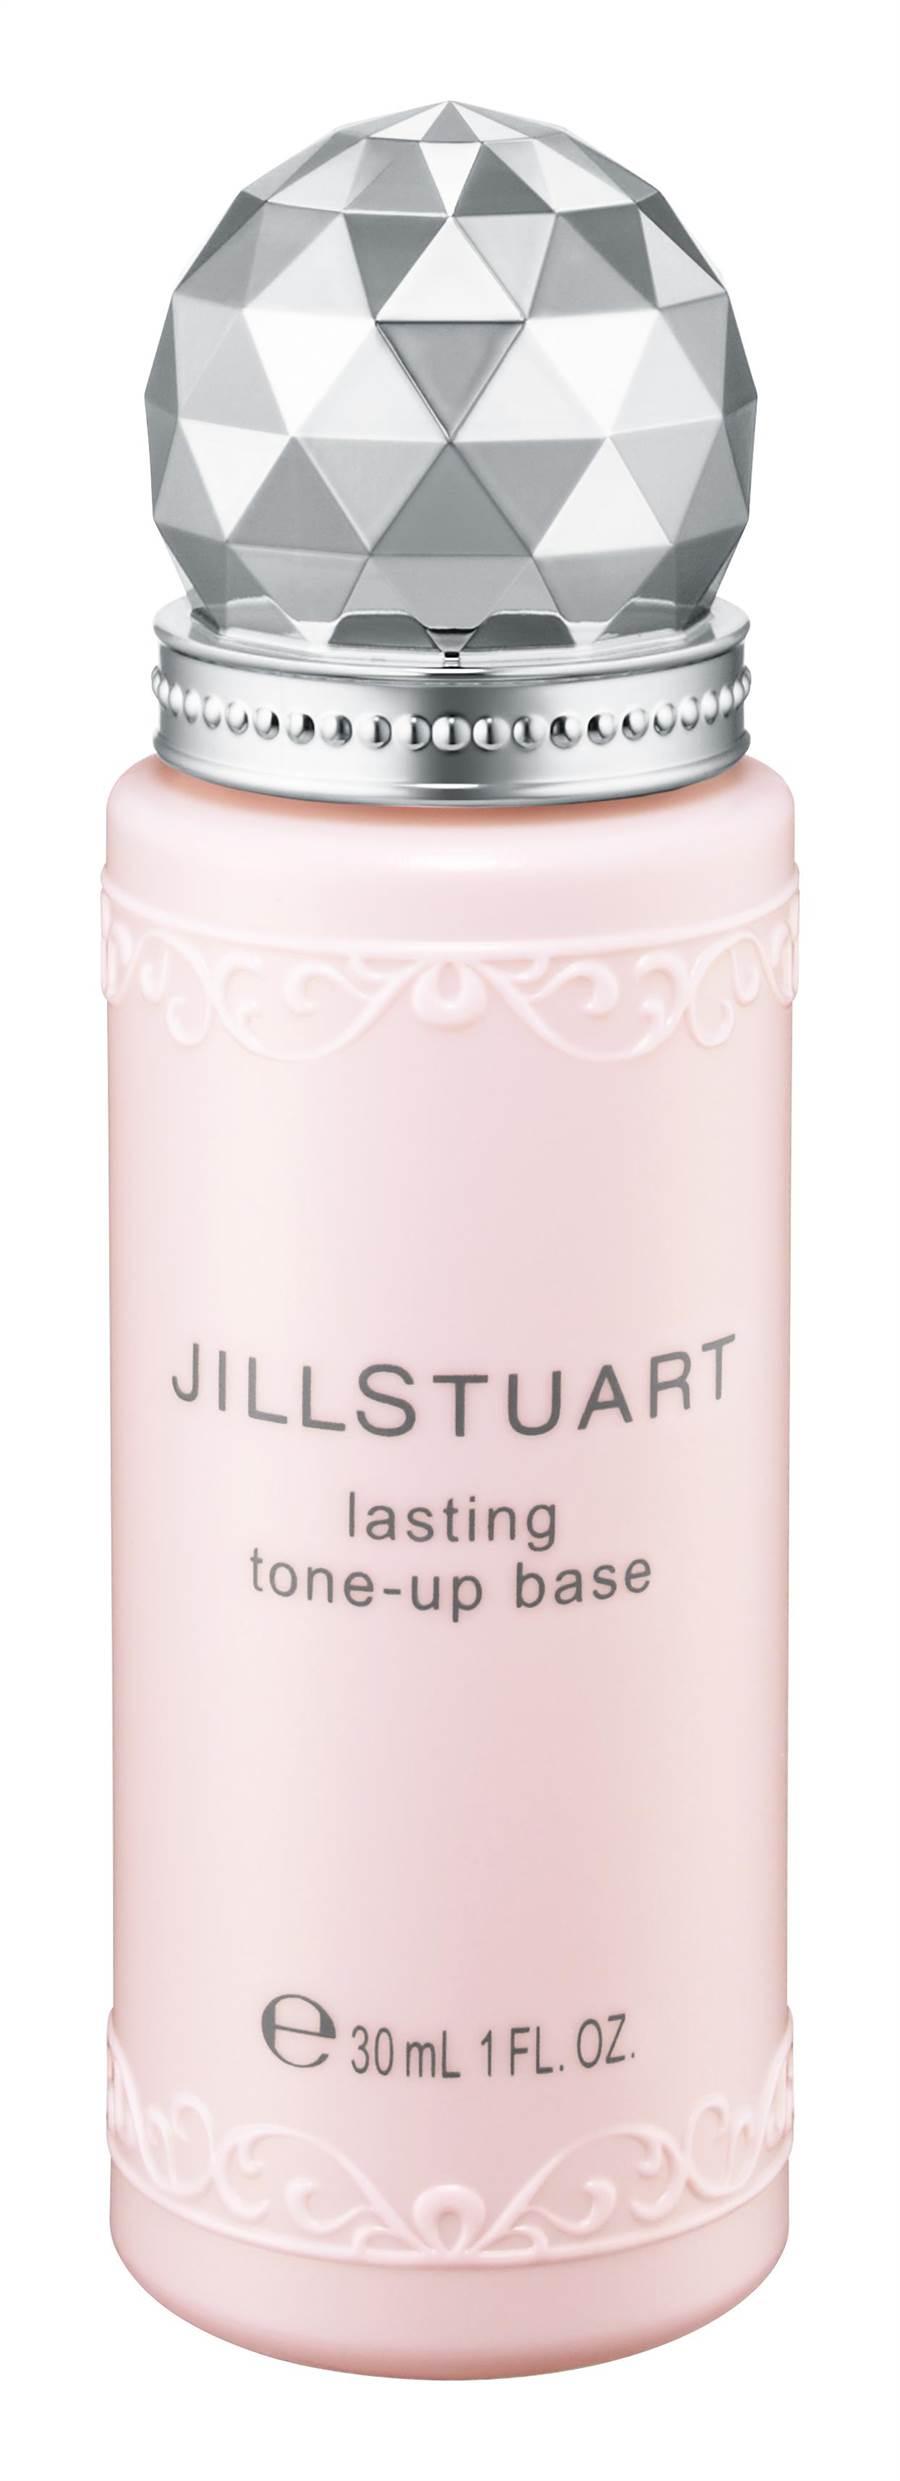 JILL STUART晶透潤色粧前乳(粉紅色),SPF35/PA+++,NT1,150:賦予自然明亮好氣色。